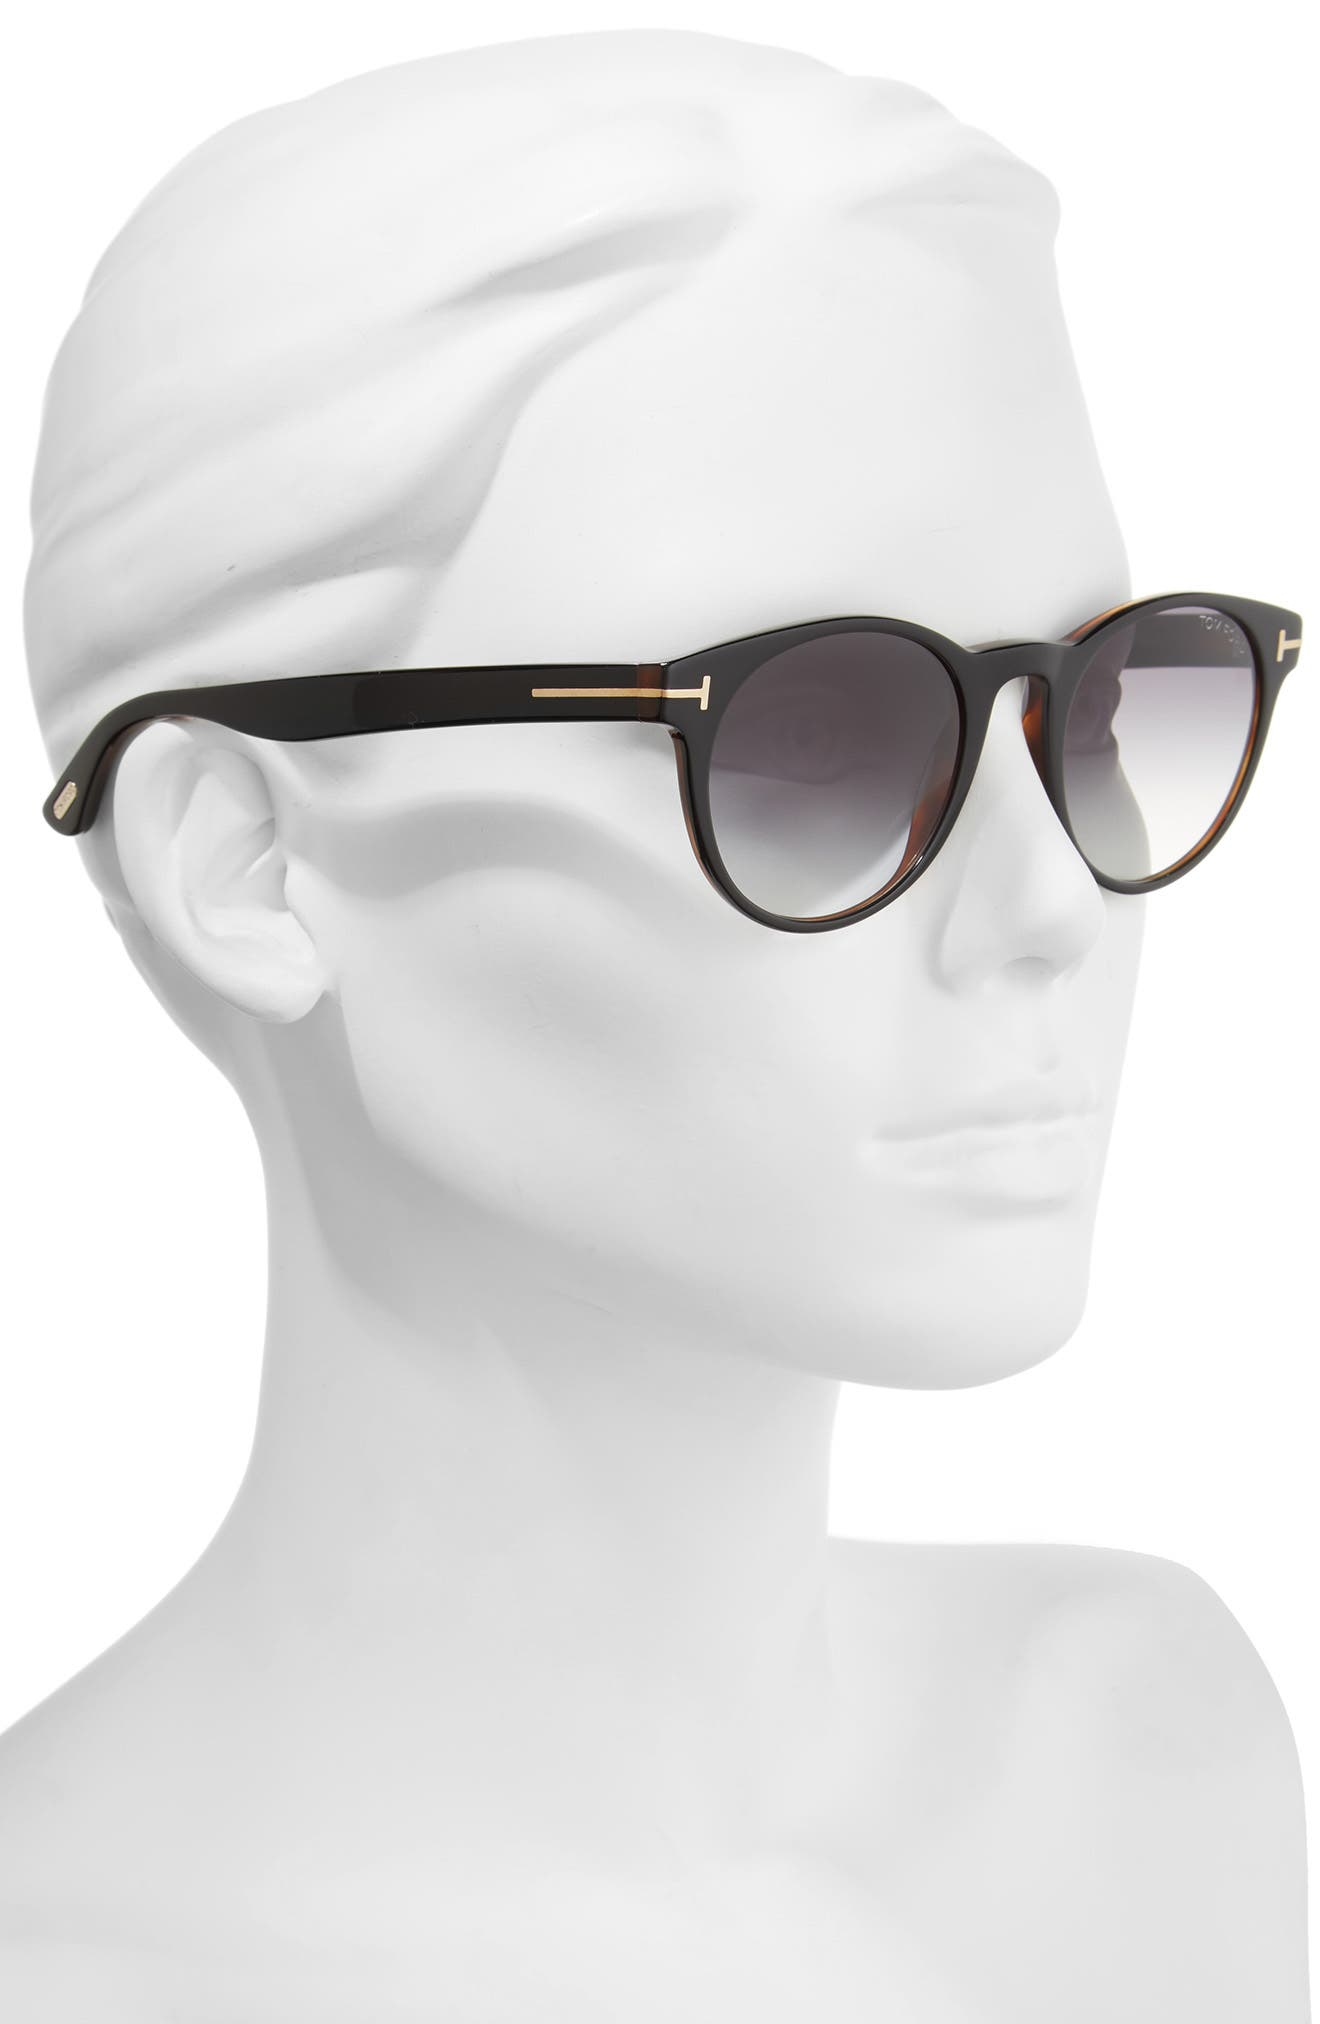 Palmer 51mm Gradient Lens Sunglasses,                             Alternate thumbnail 2, color,                             001